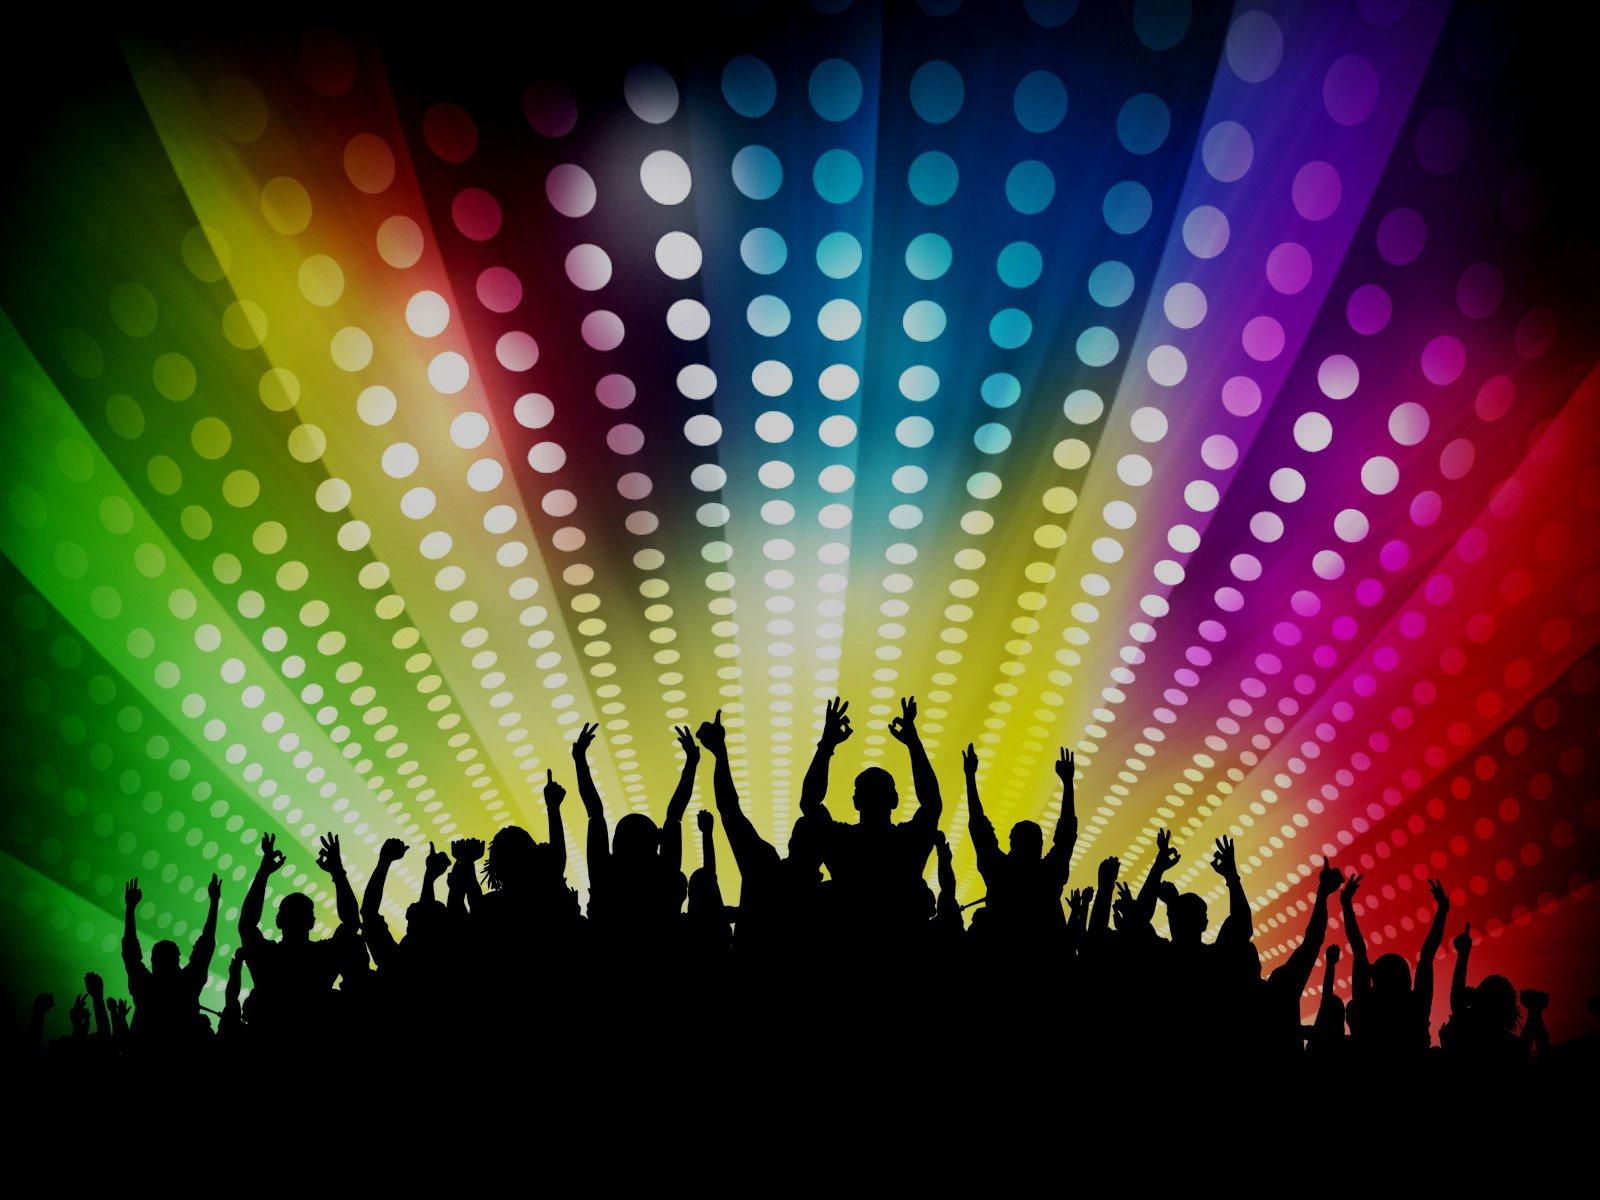 download disco dance floor wallpaper displaying 19 images for 1600x1200